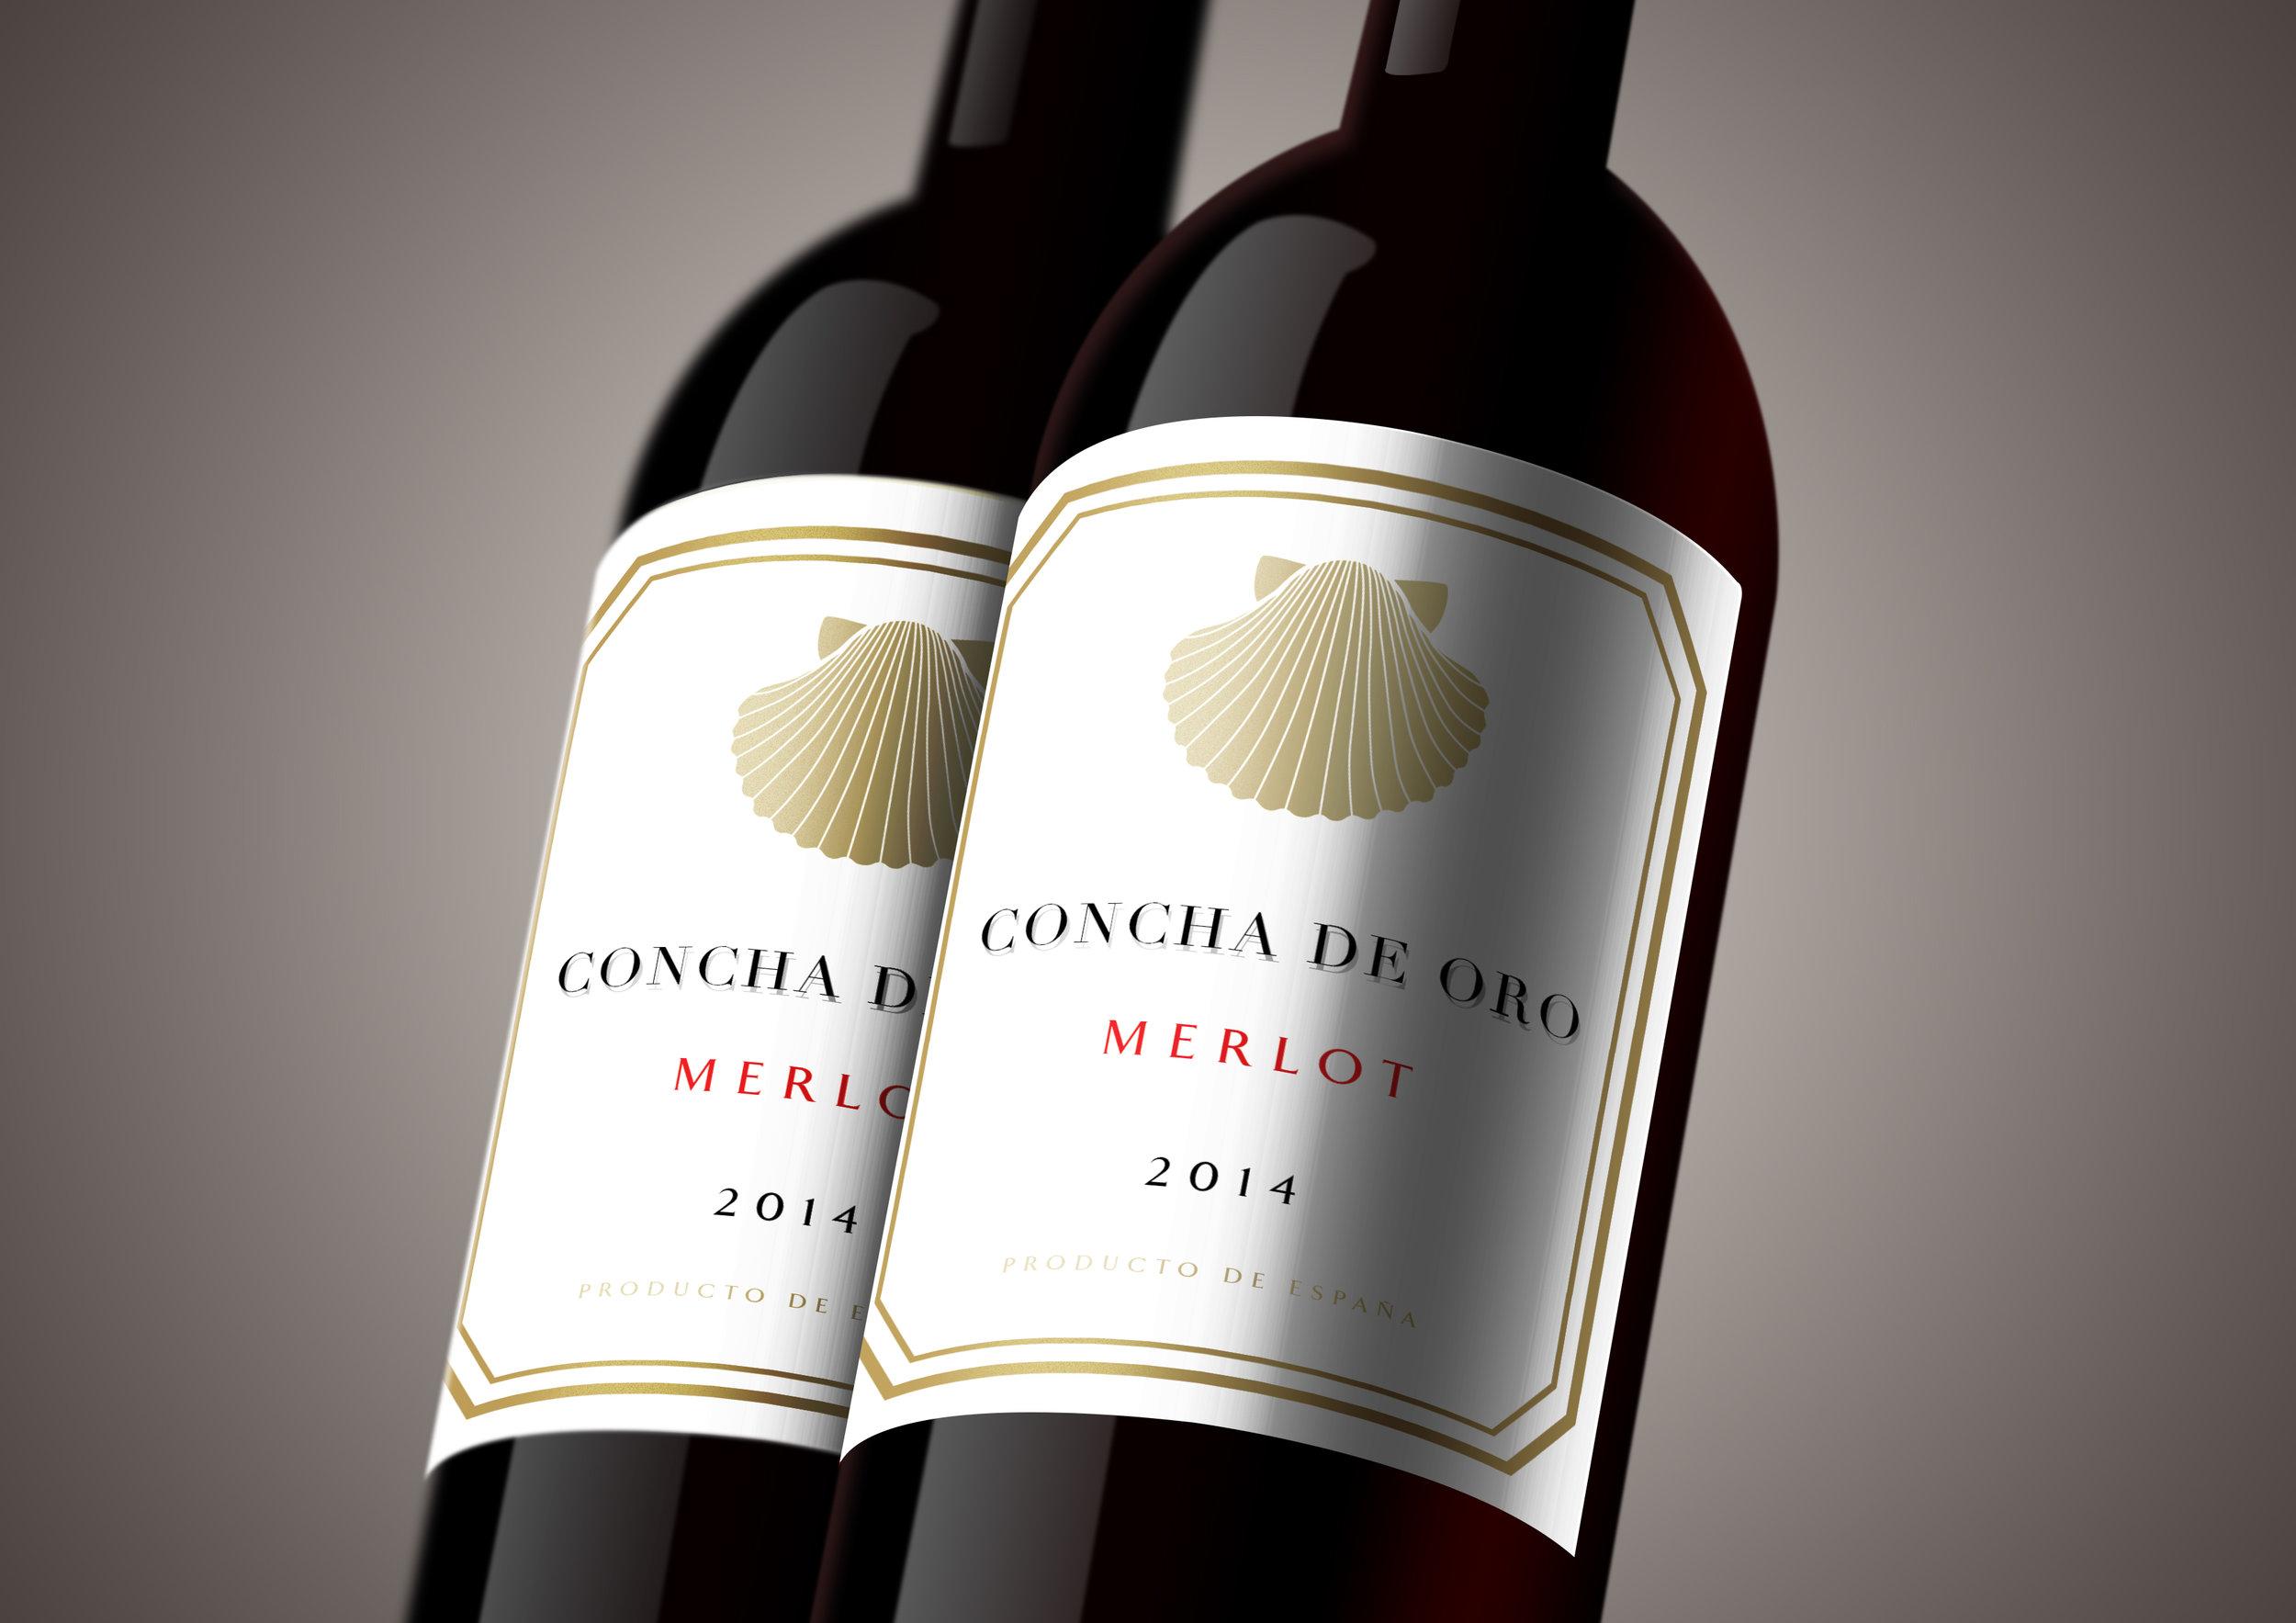 Concha De Oro 2 bottle shot.jpg